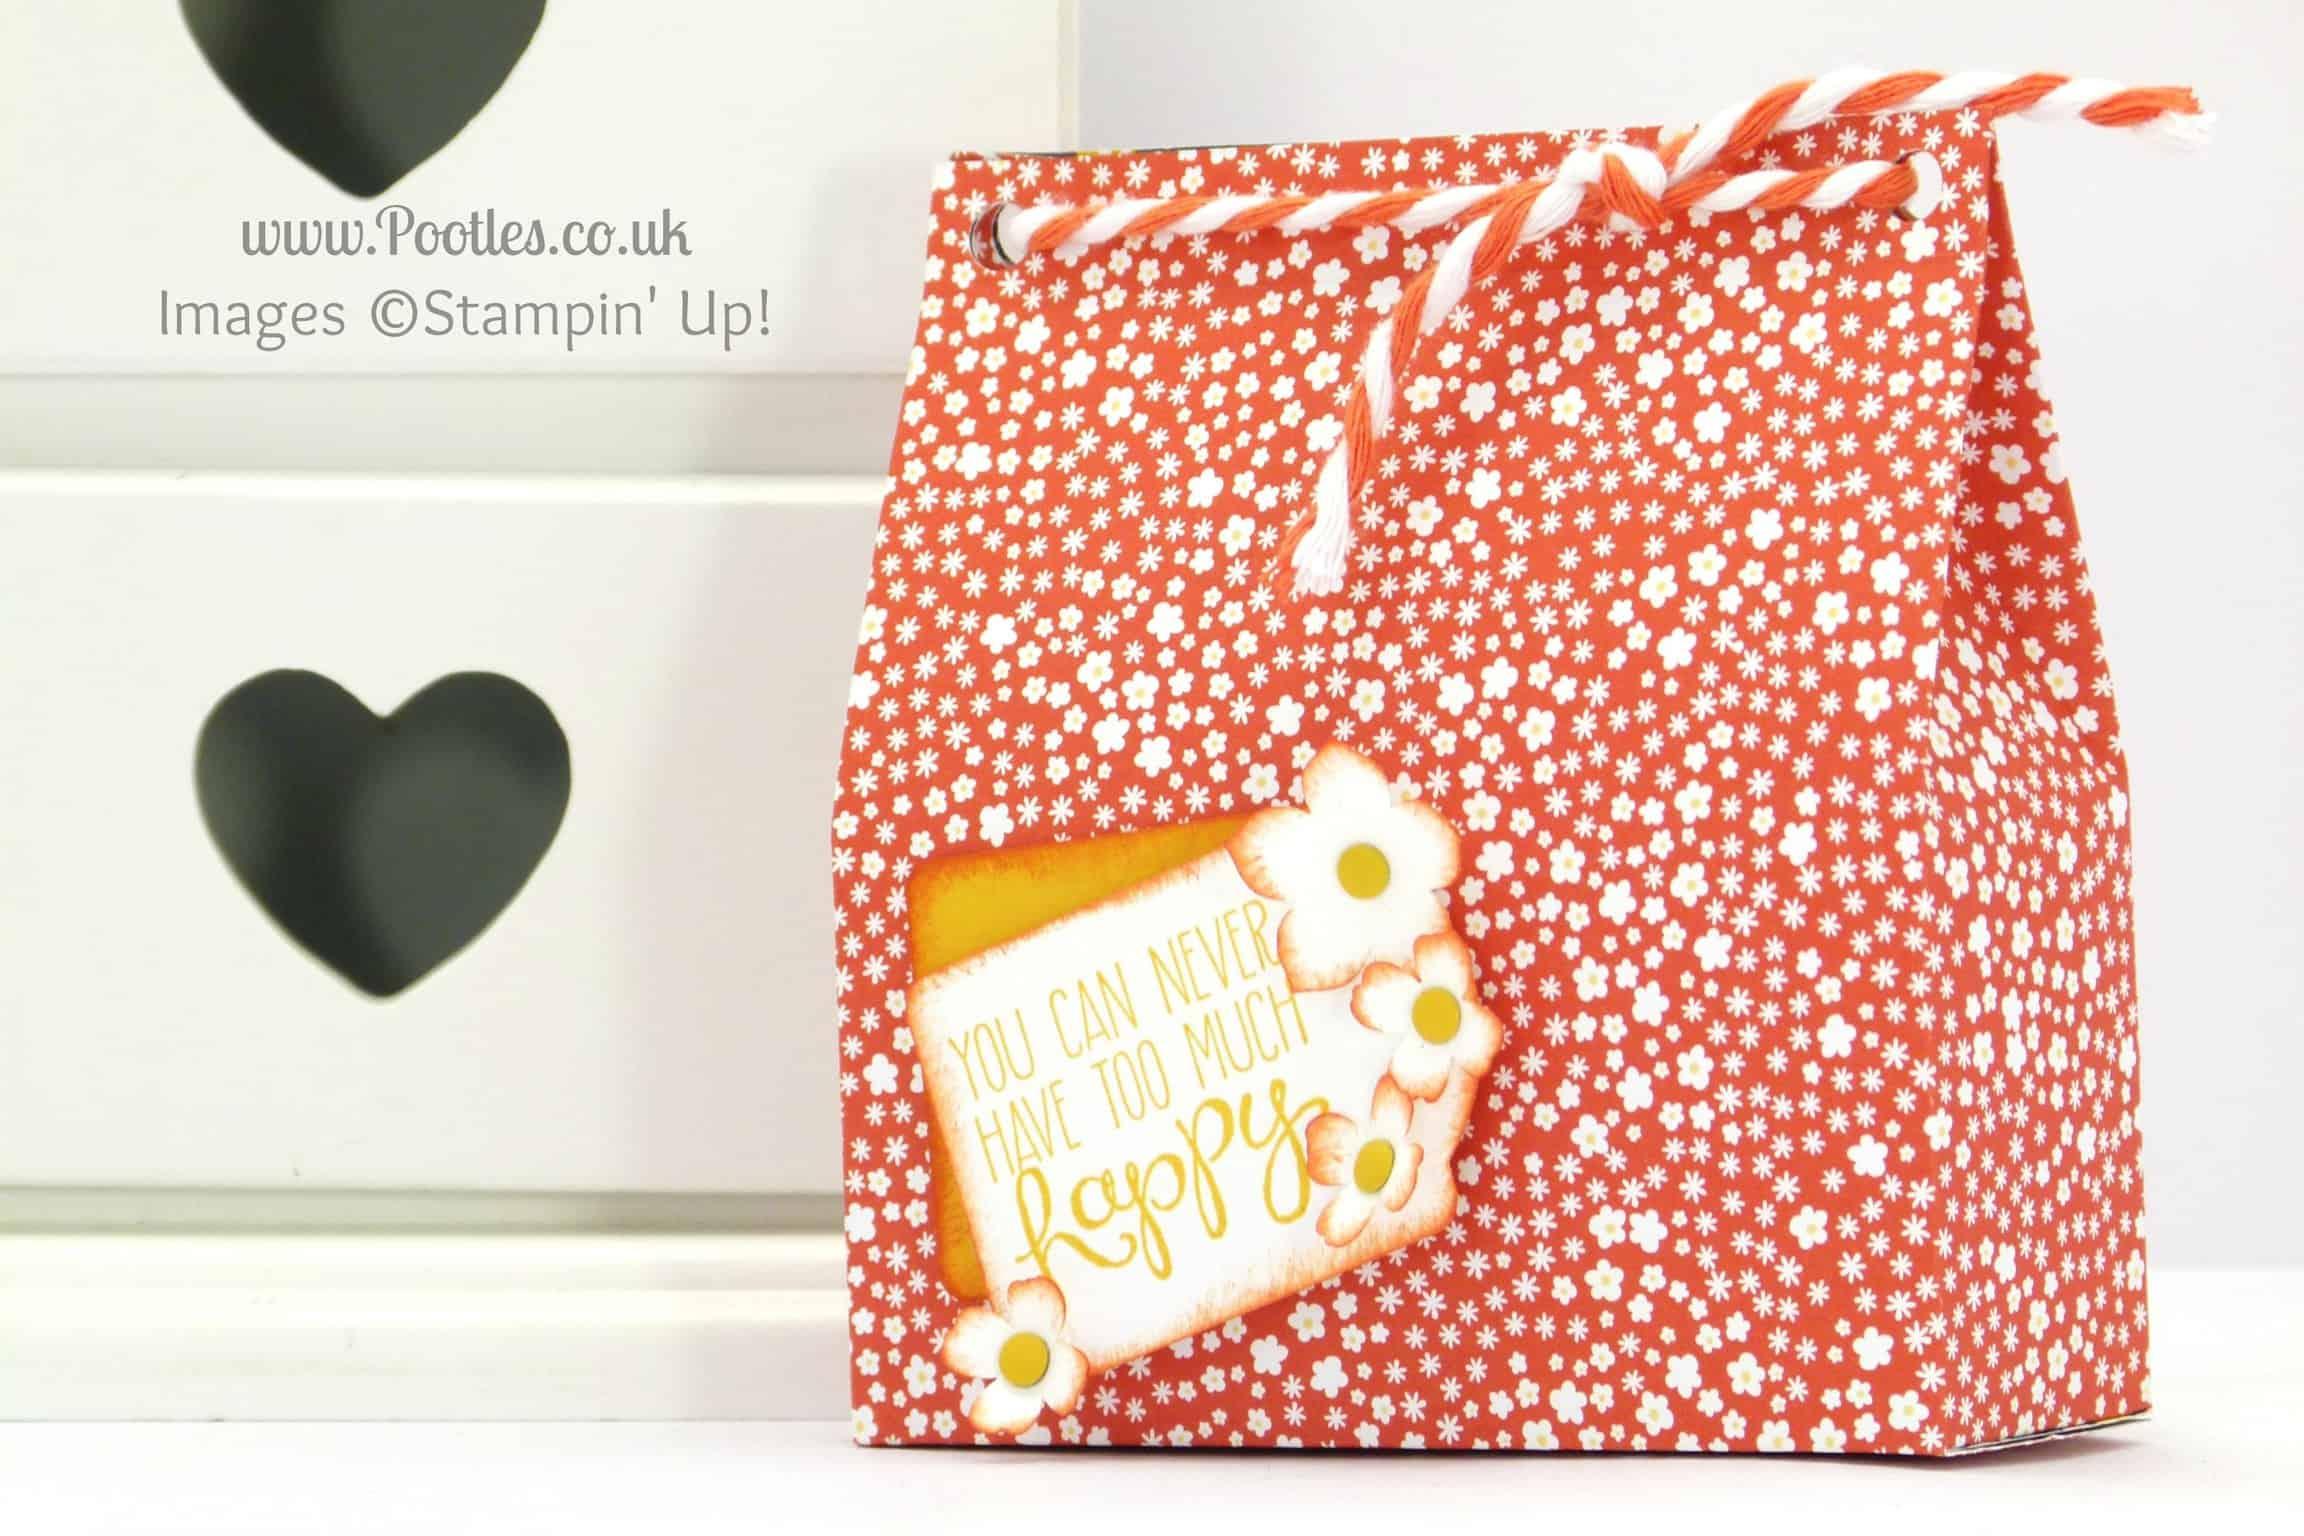 stampin up uk demonstrator pootles monochrome paper bag tutorial flower pot variation